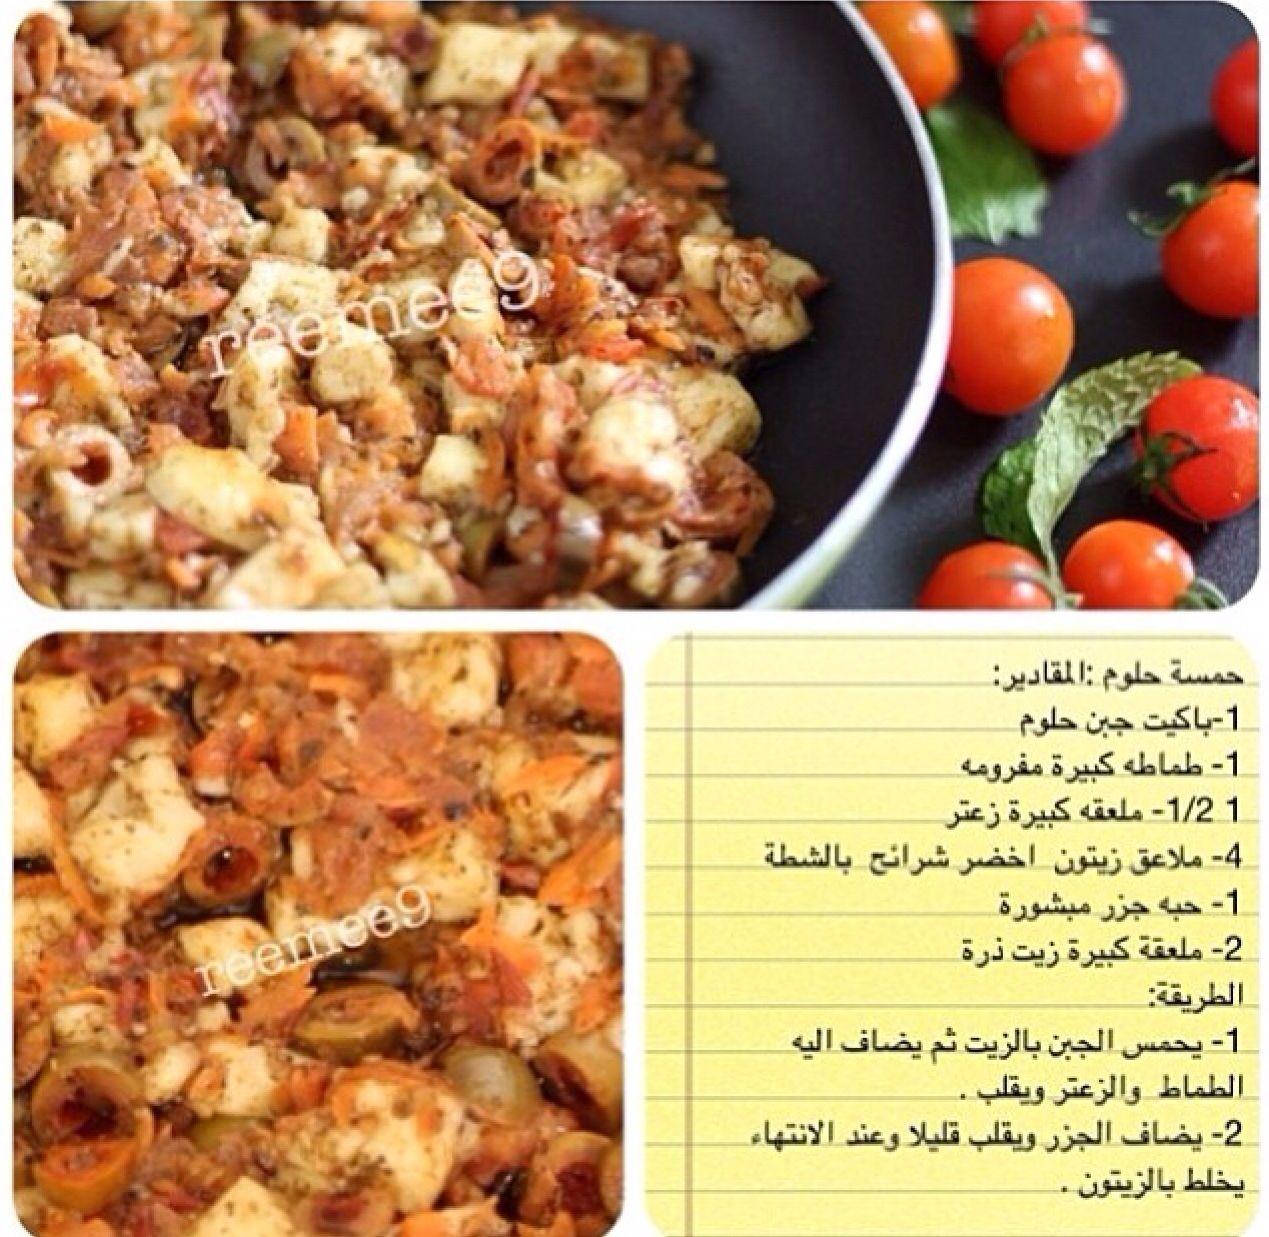 حمسة حلوم Food Dishes Cooking Recipes Cooking